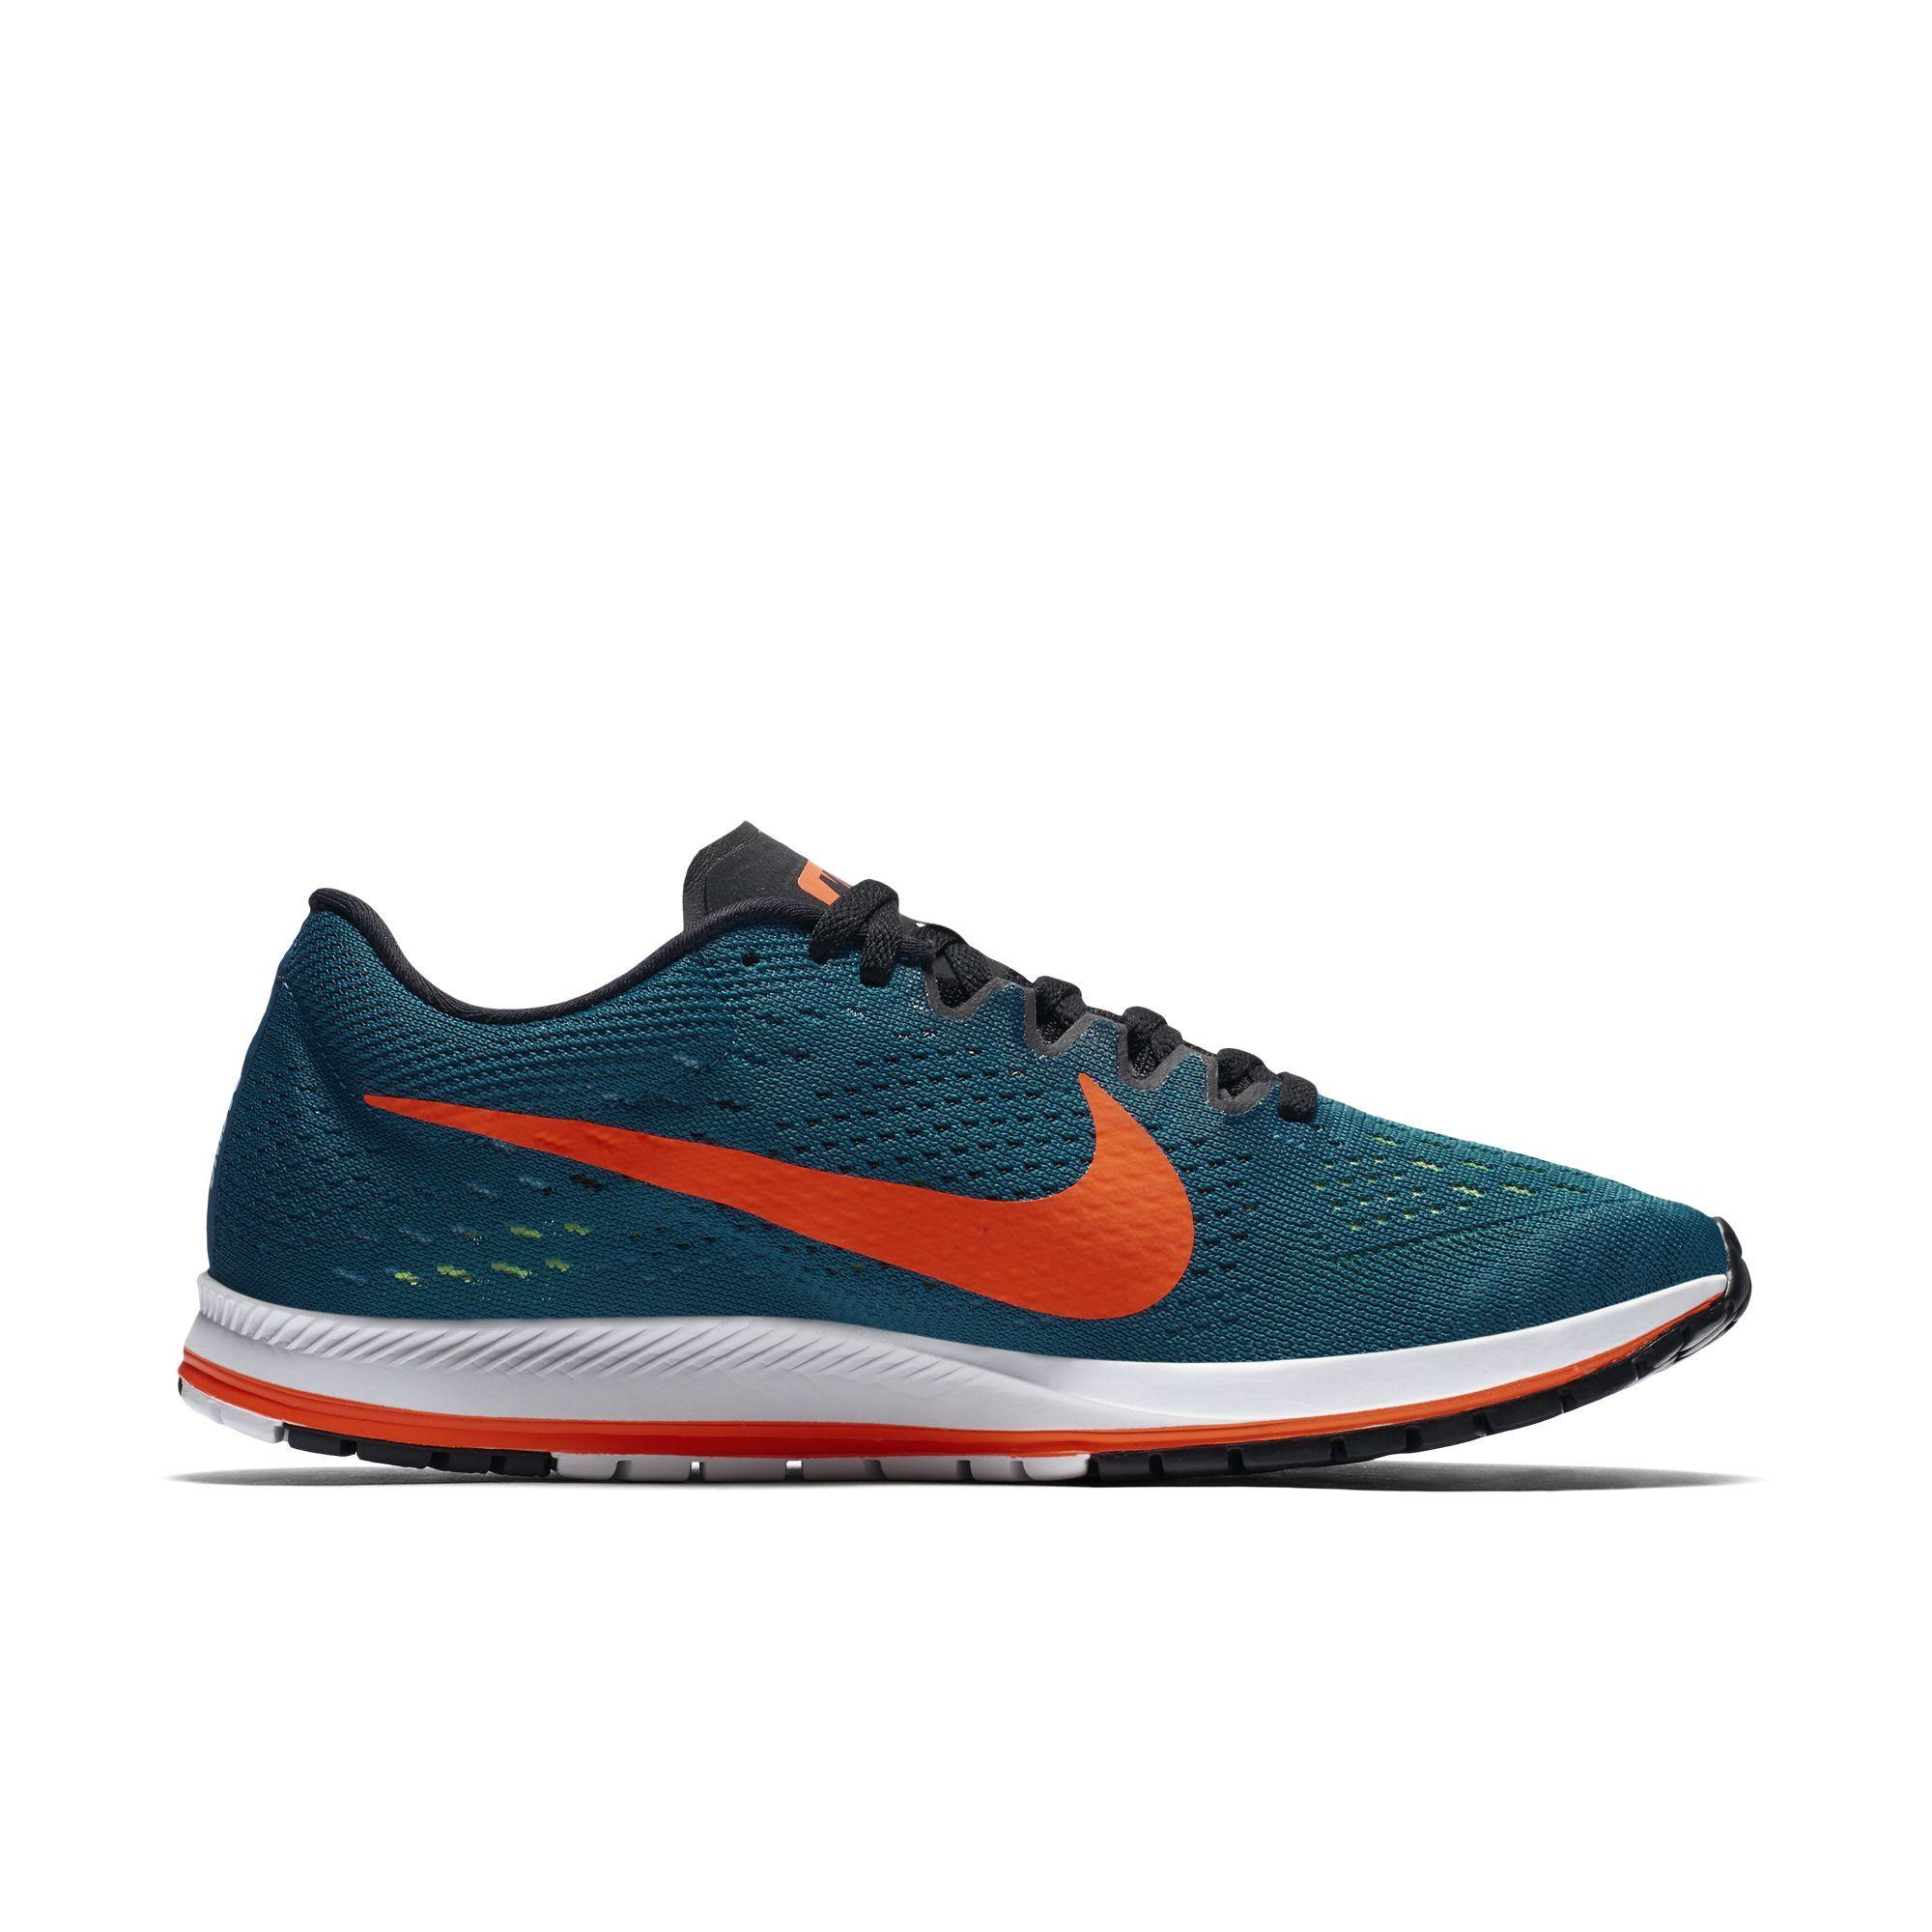 new product af77c e5682 Nike Zoom Streak 6 - Unisex   Fleet Feet